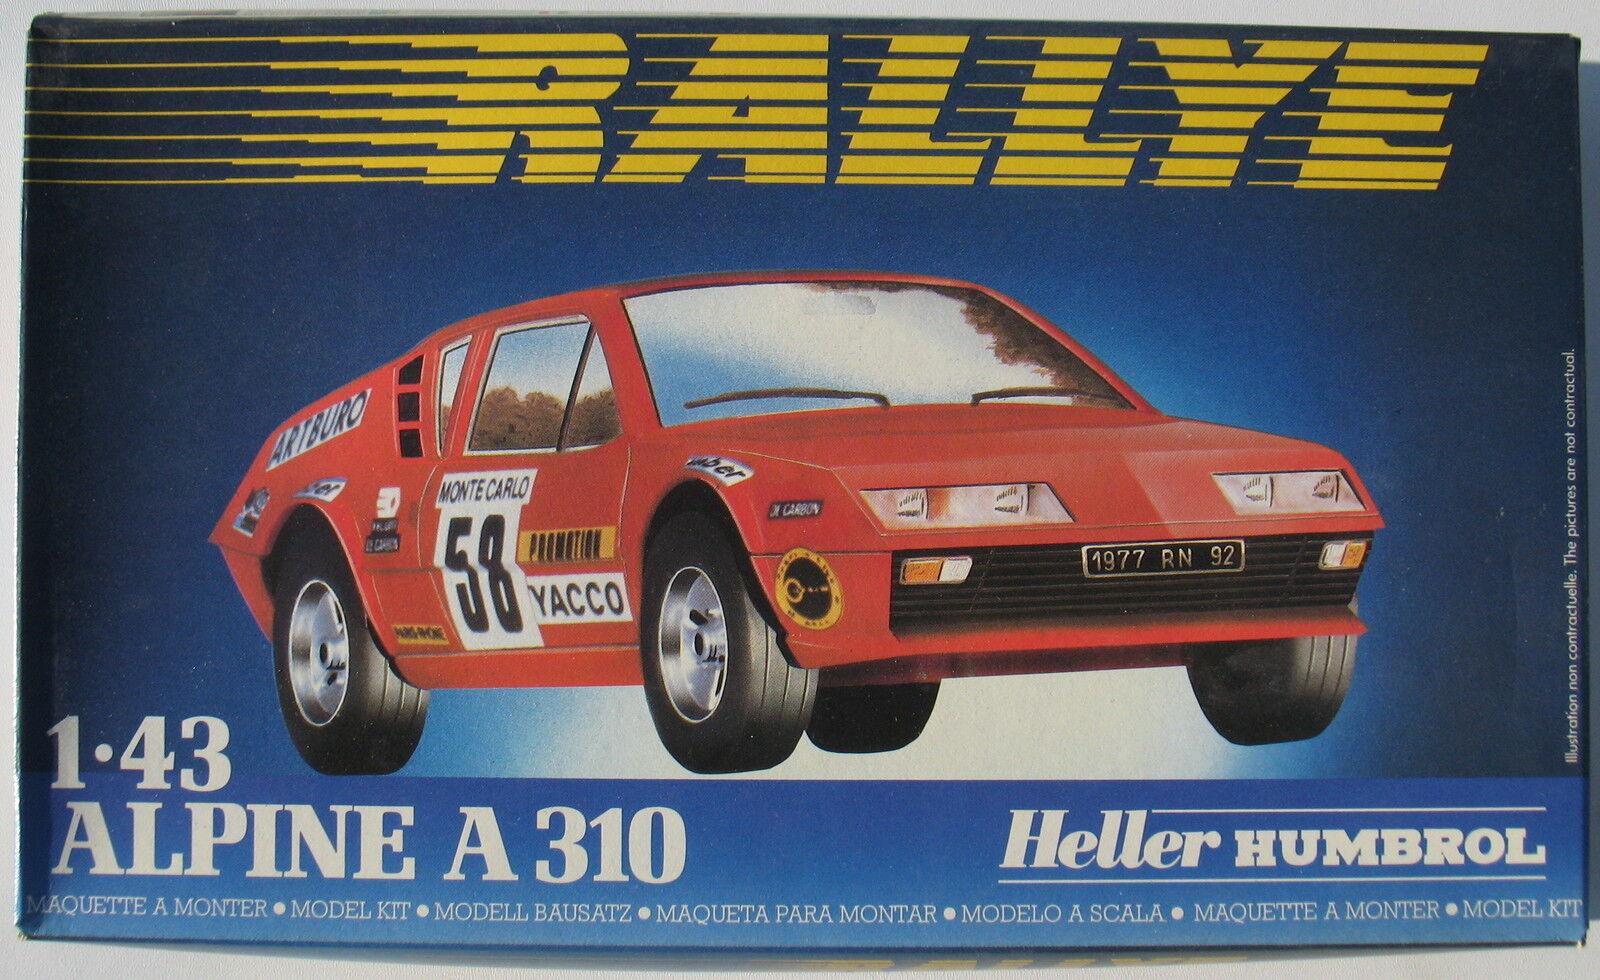 Heller 80146 - ALPINE A 310 - RALLYE - 1 43 - Car Modelbausatz - Model Kit